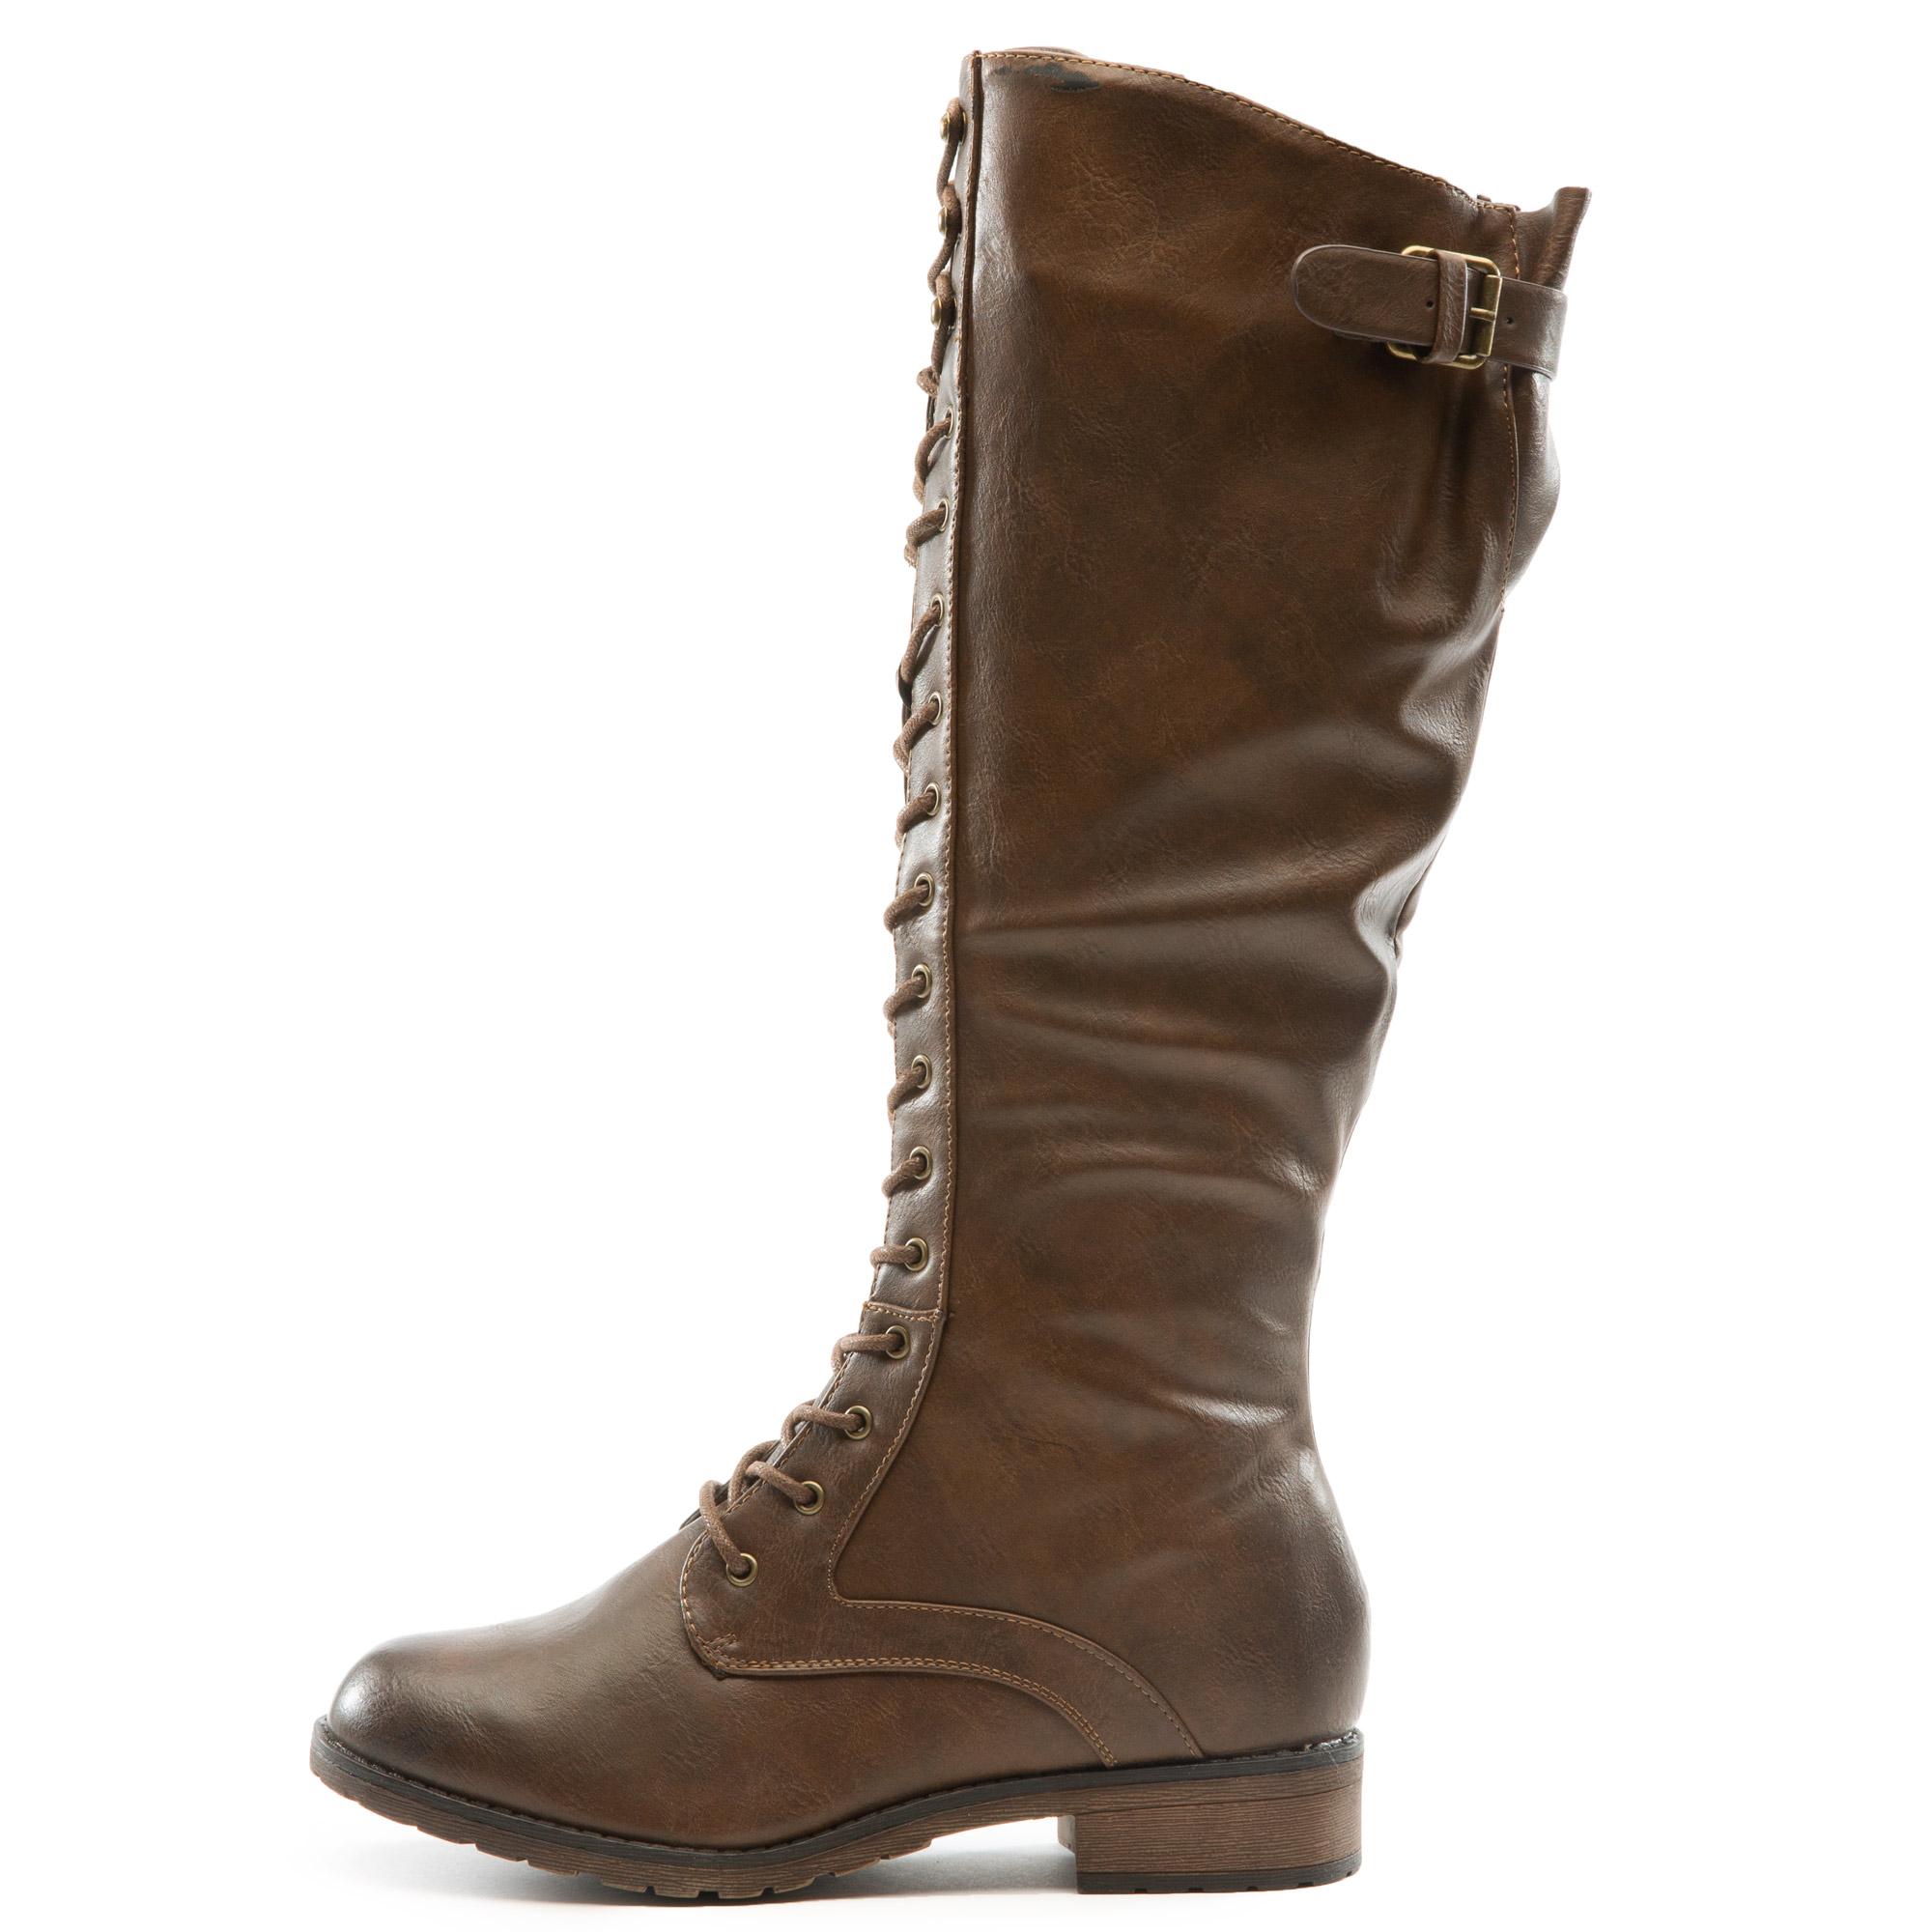 Ride-3 Combat Boots Brown